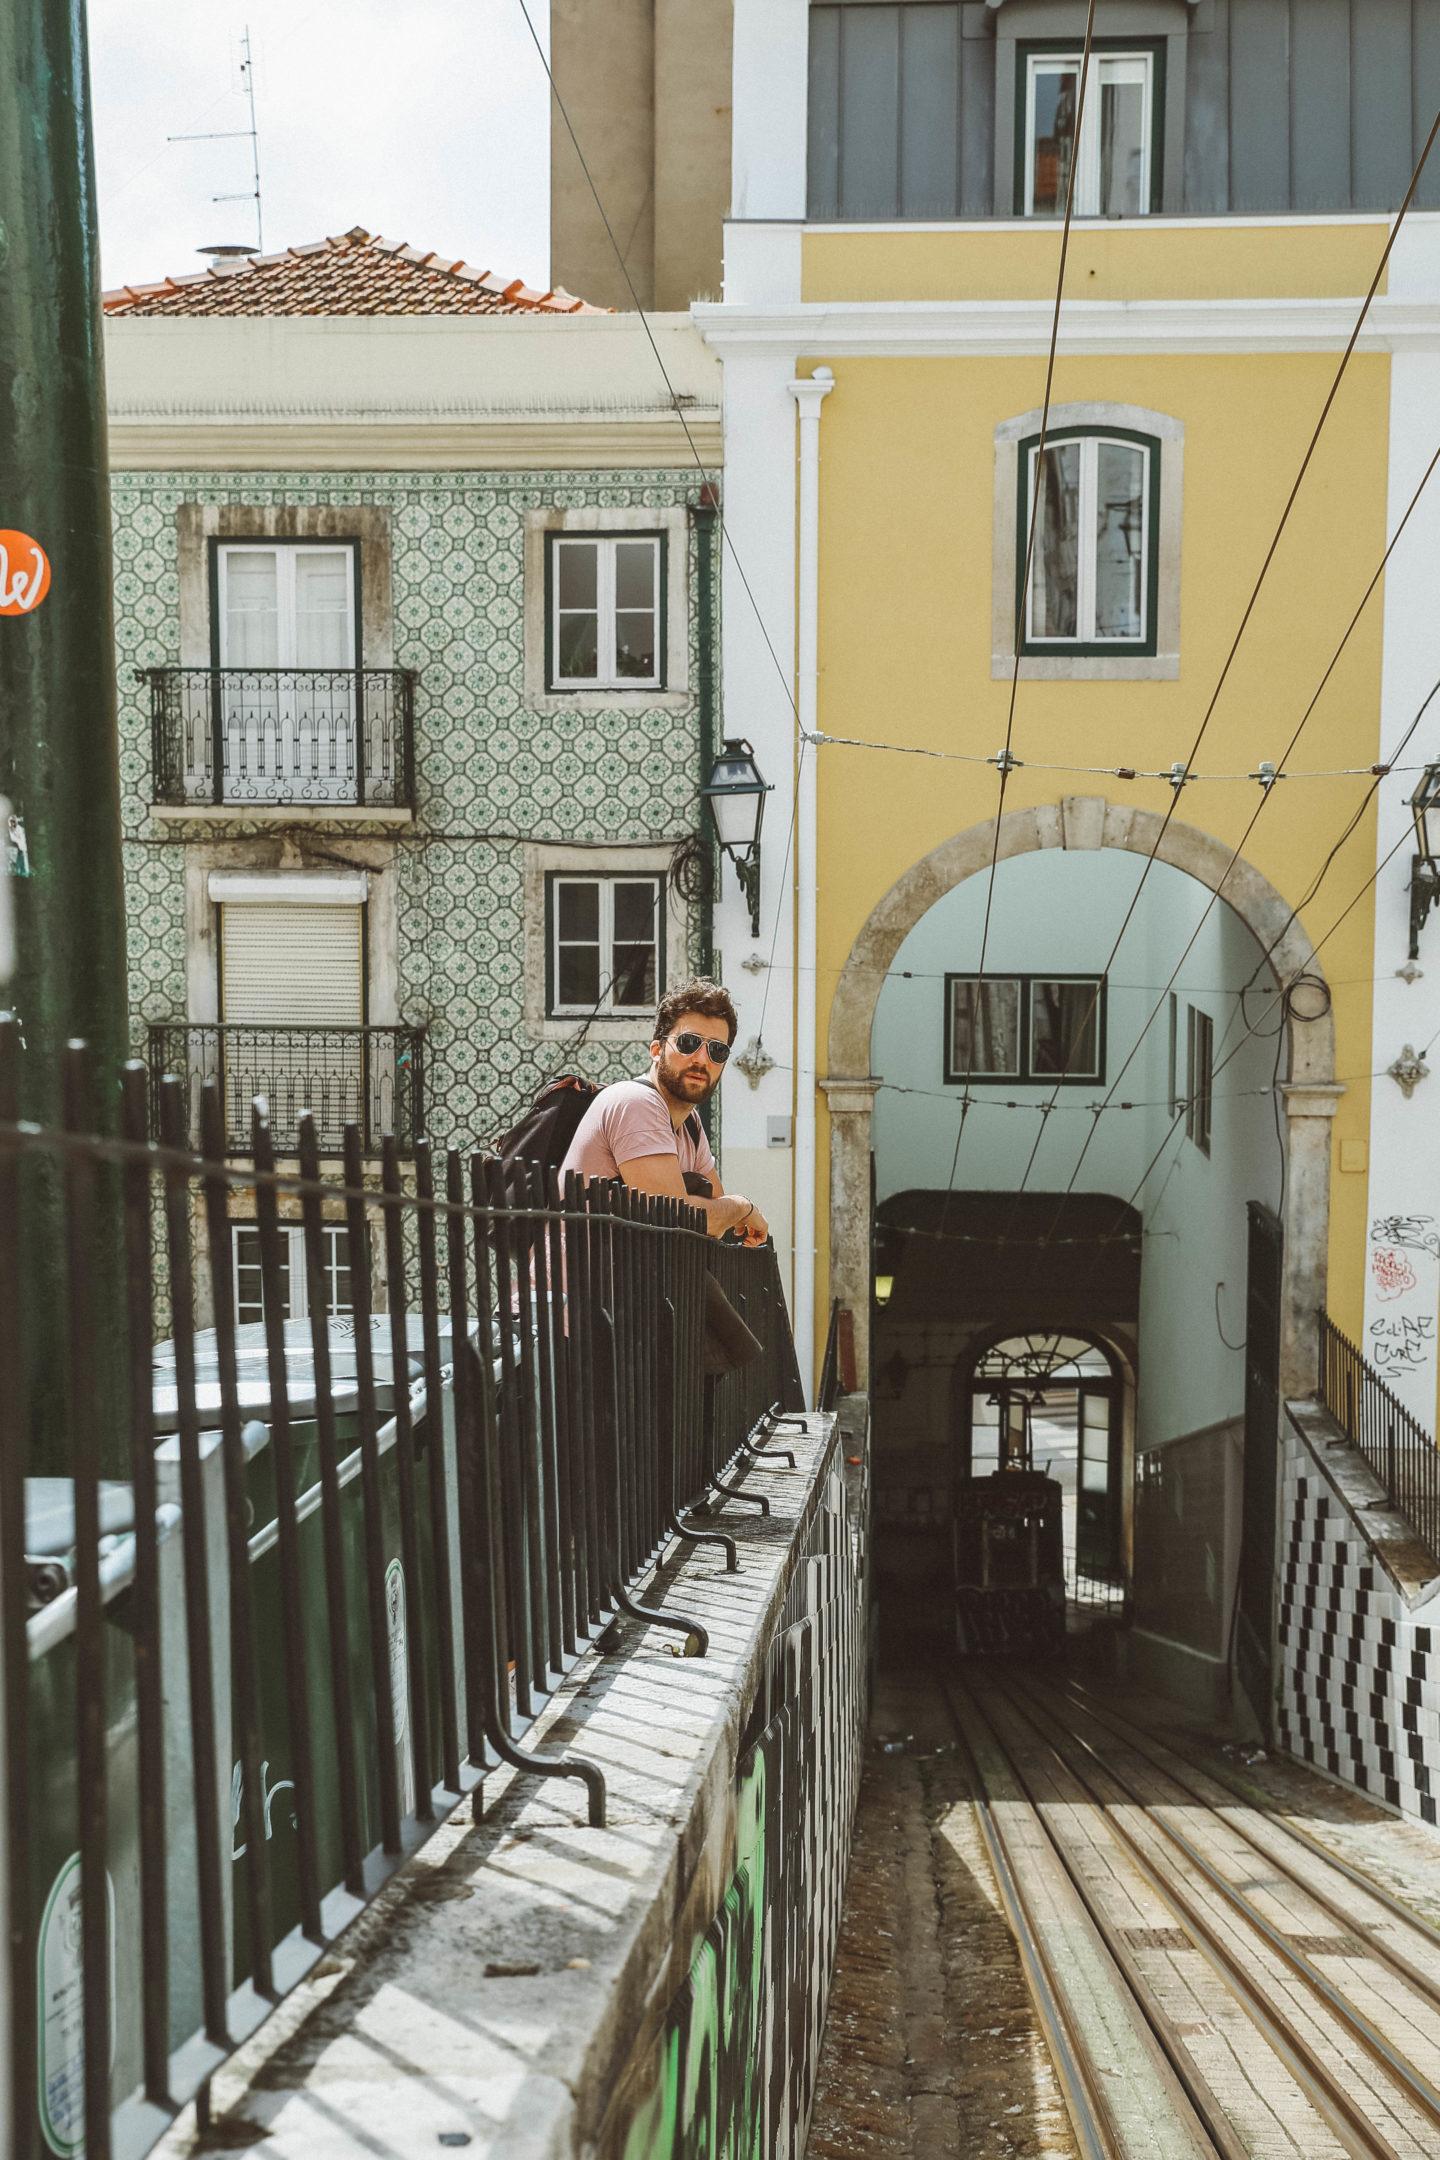 Tramway Lisbonne - Blondie Baby blog mode Paris et voyages